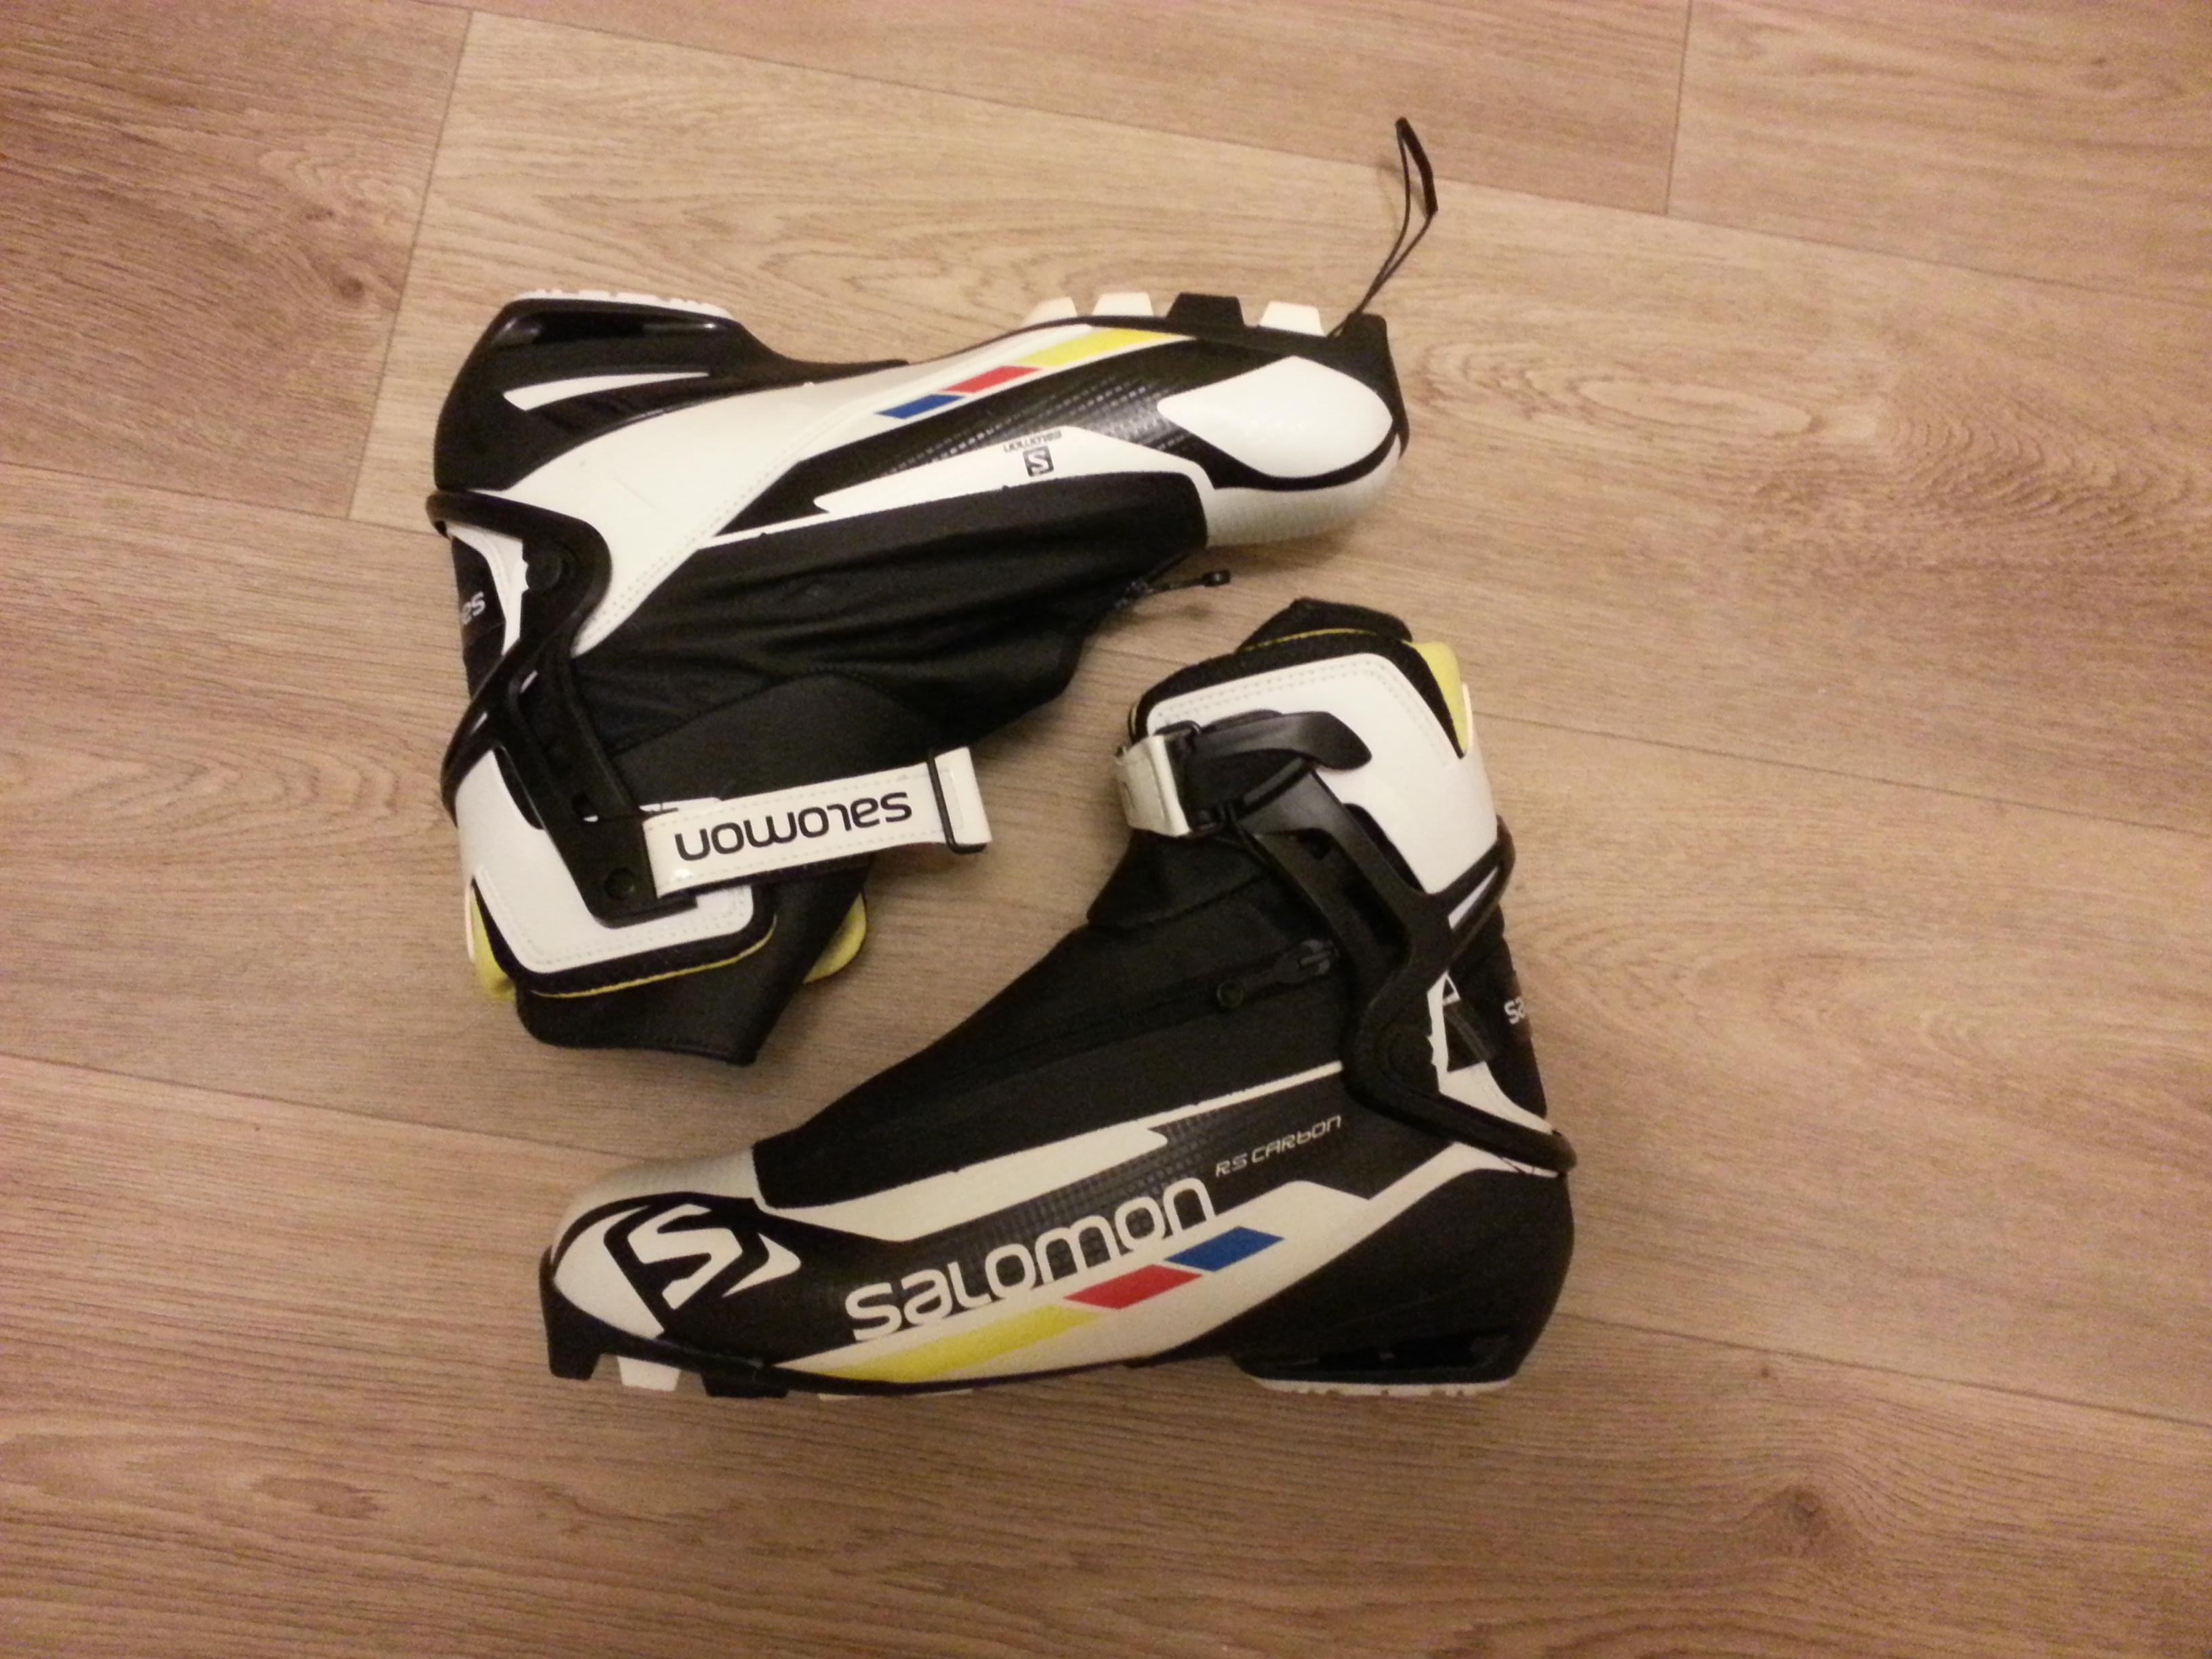 Nové Salomon RS Carbon Skate 14 15 vel. 46 - Bazar - Běžky.net 9b75d9d9d4